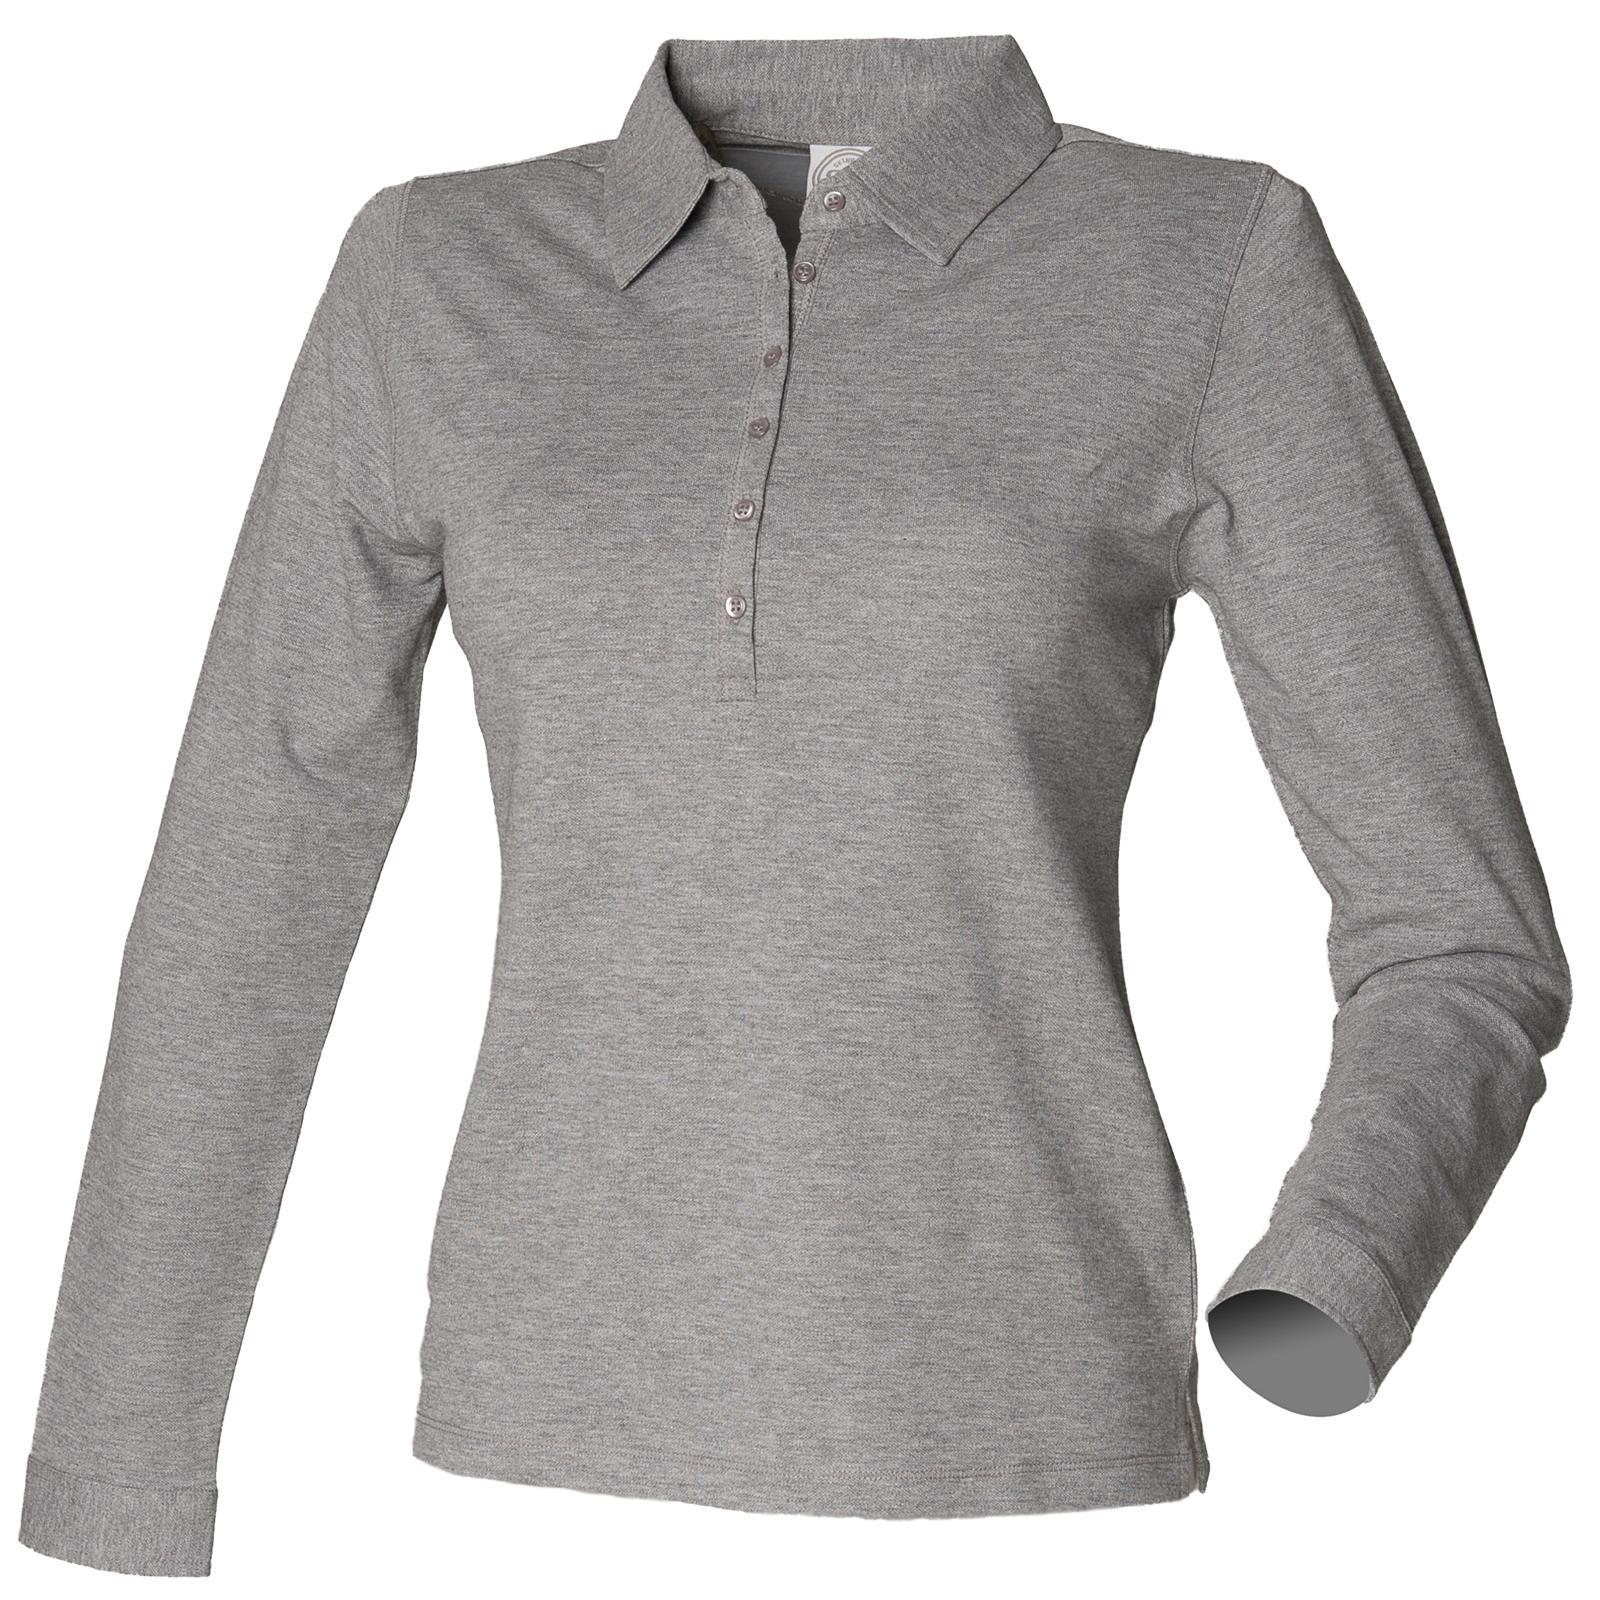 46b2bac86 New SKINNI FIT Womens Ladies Long Sleeve Stretch Polo Shirt 4 ...